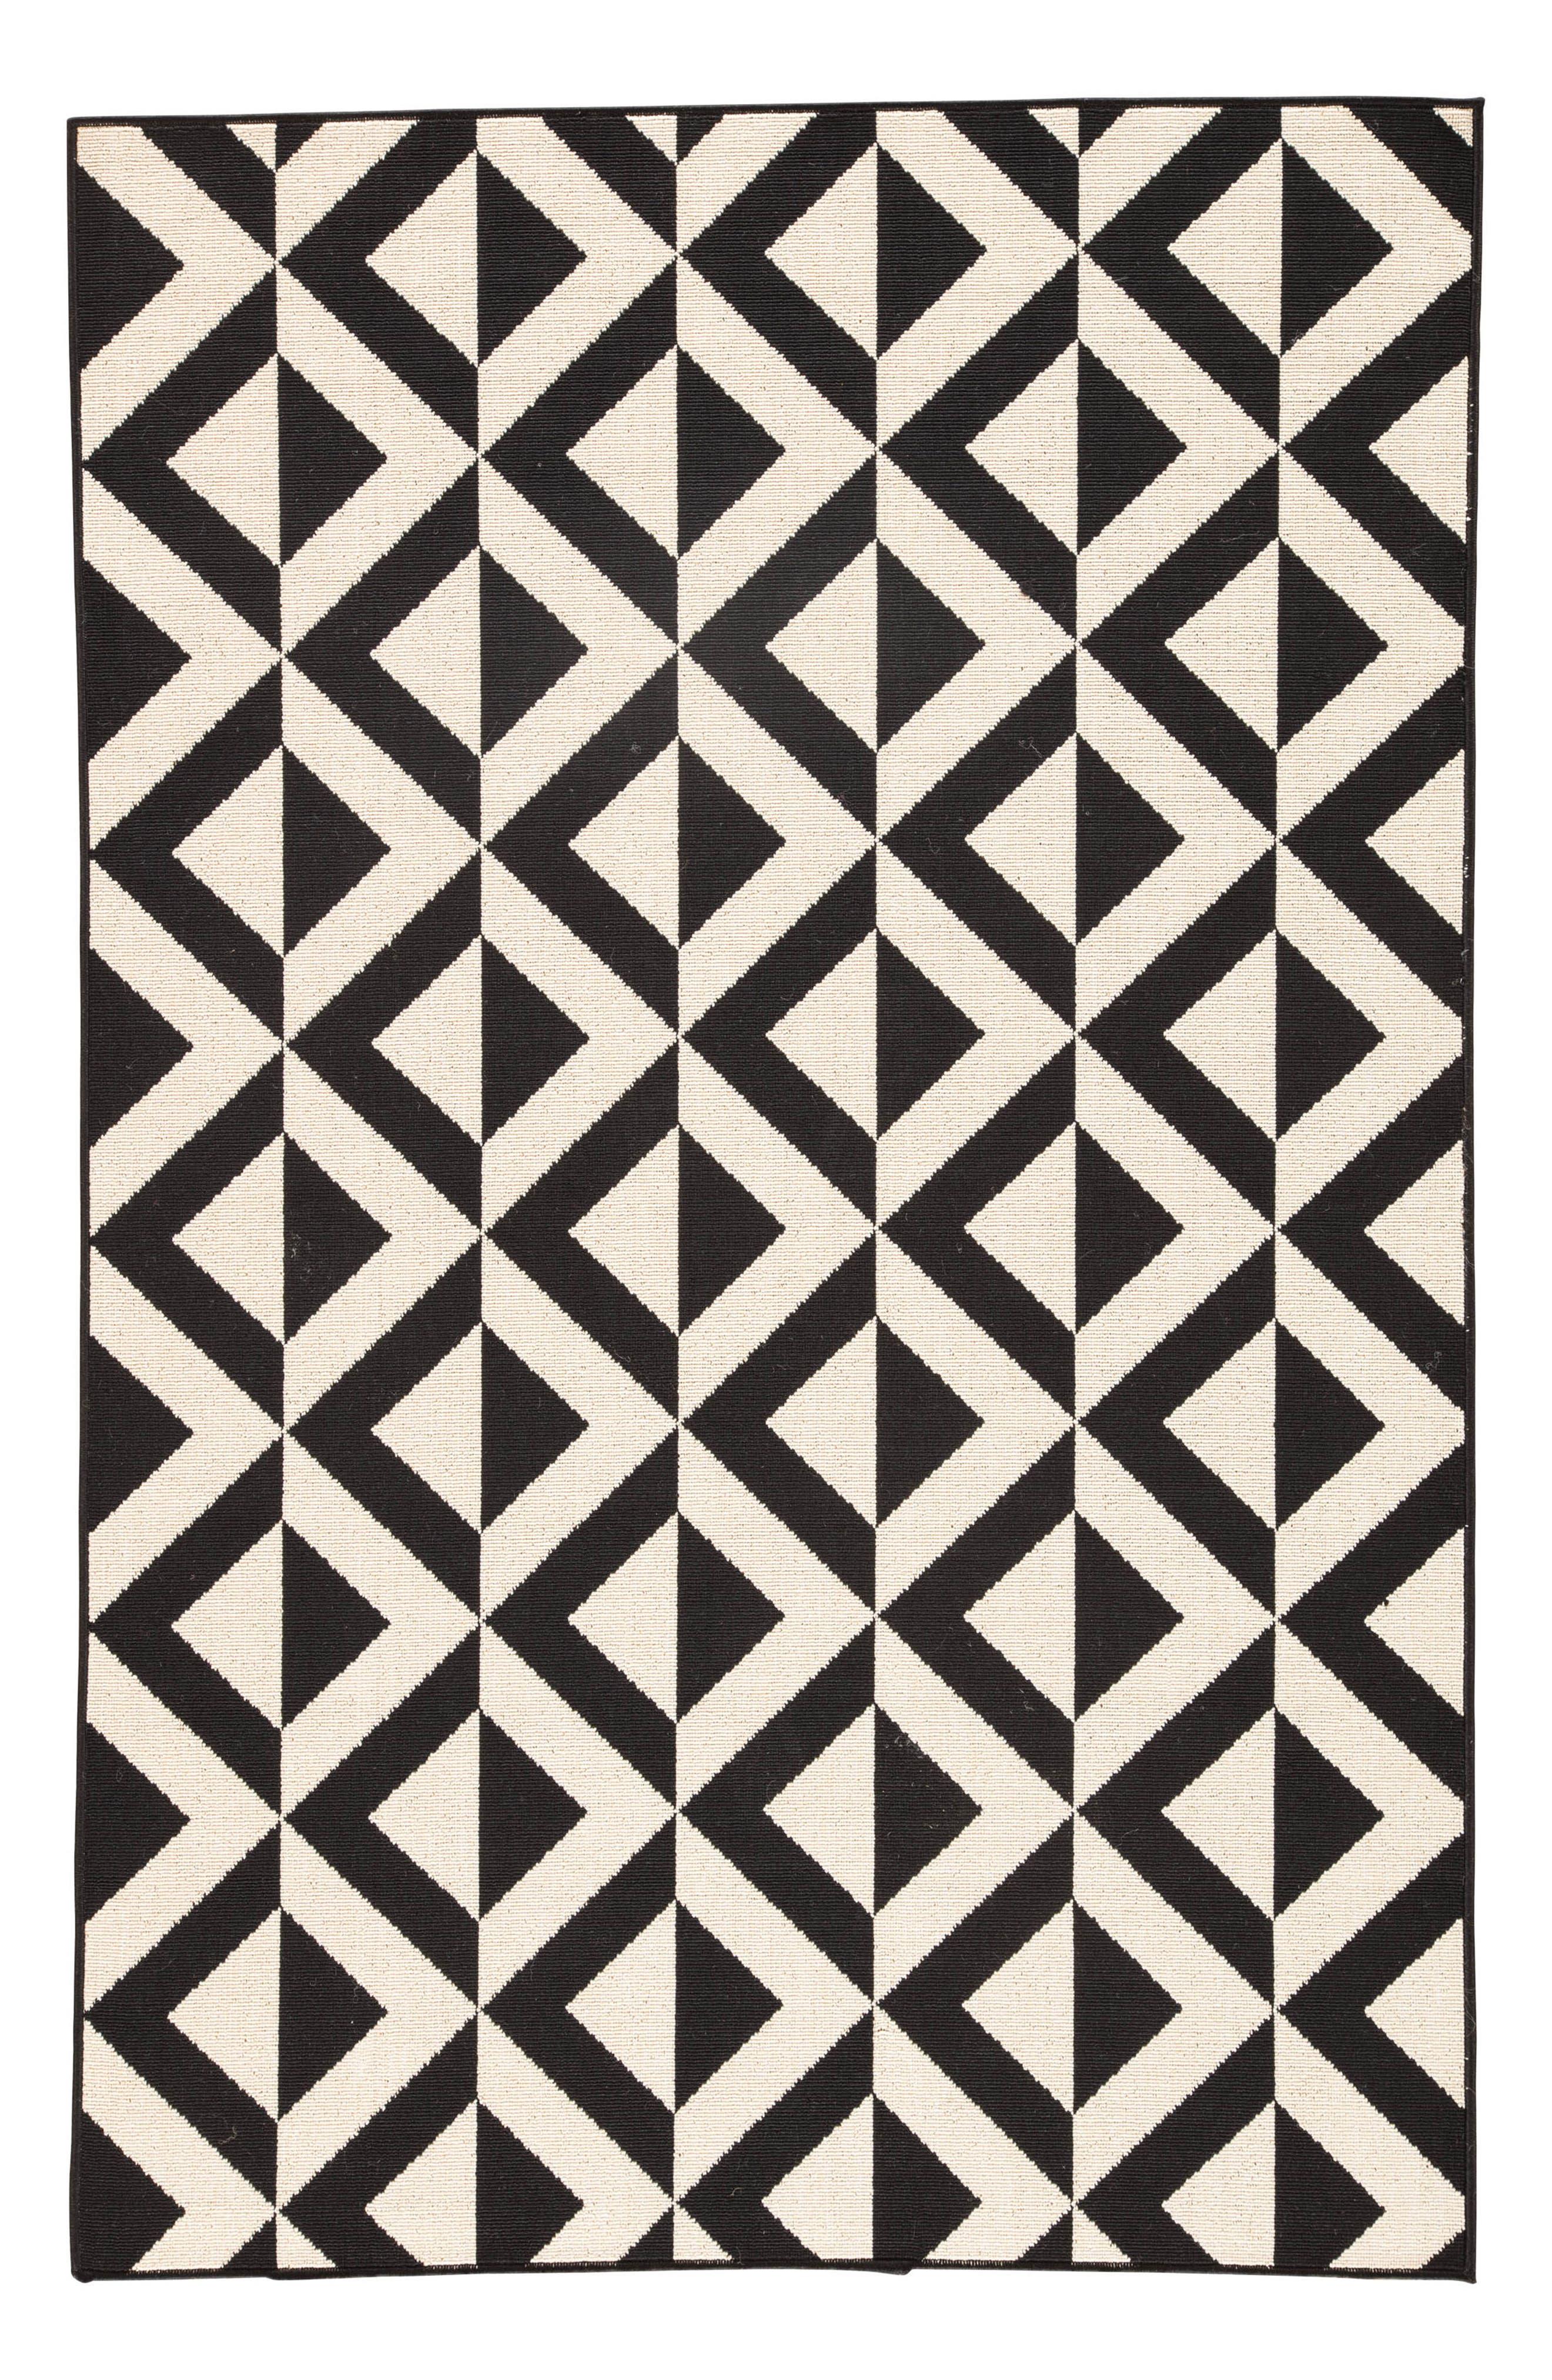 Alternate Image 1 Selected - Jaipur Geometric Pattern Rug